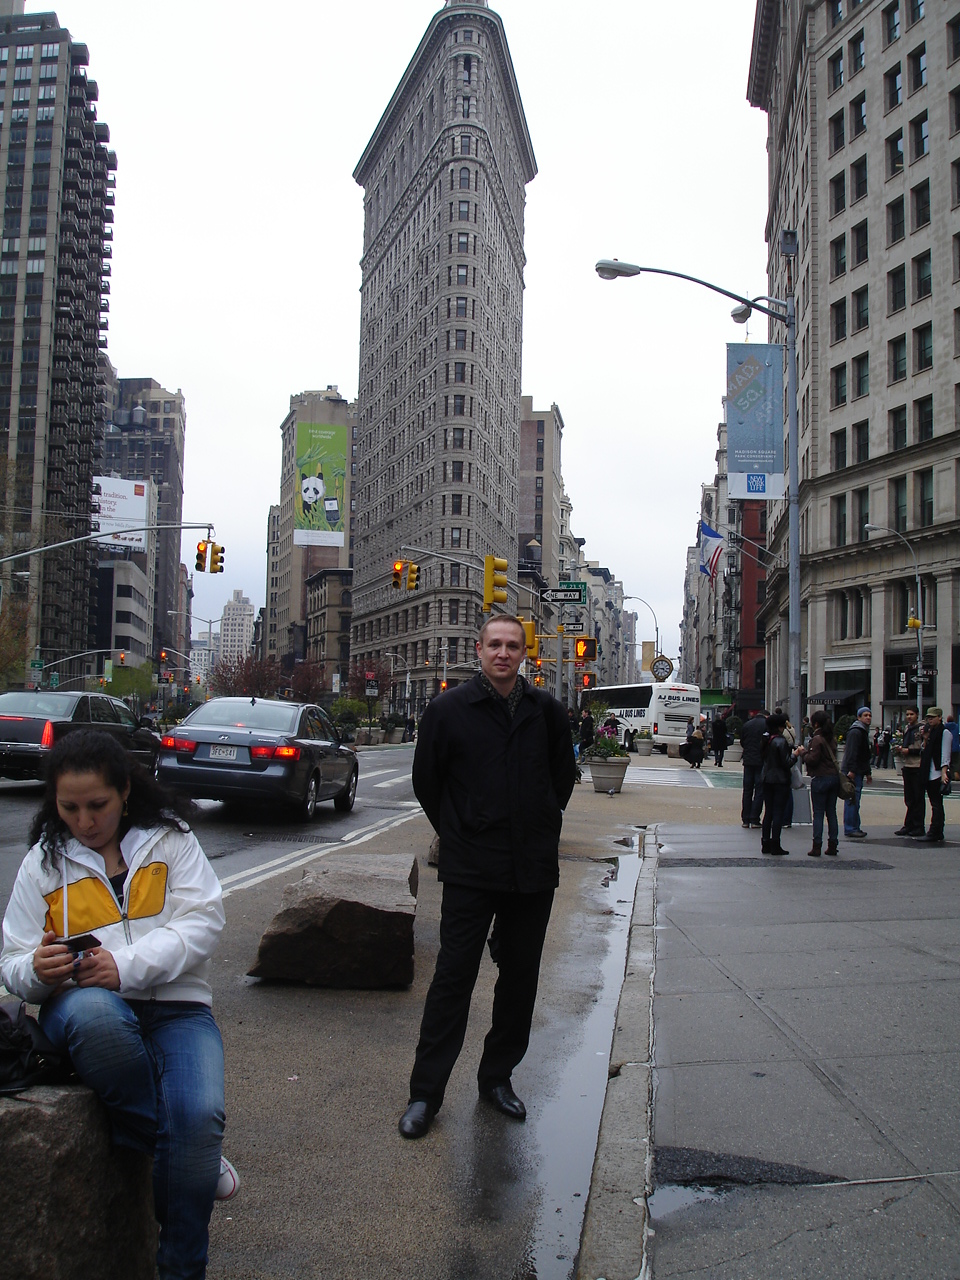 Нью-Йорк. Пятая Авеню.